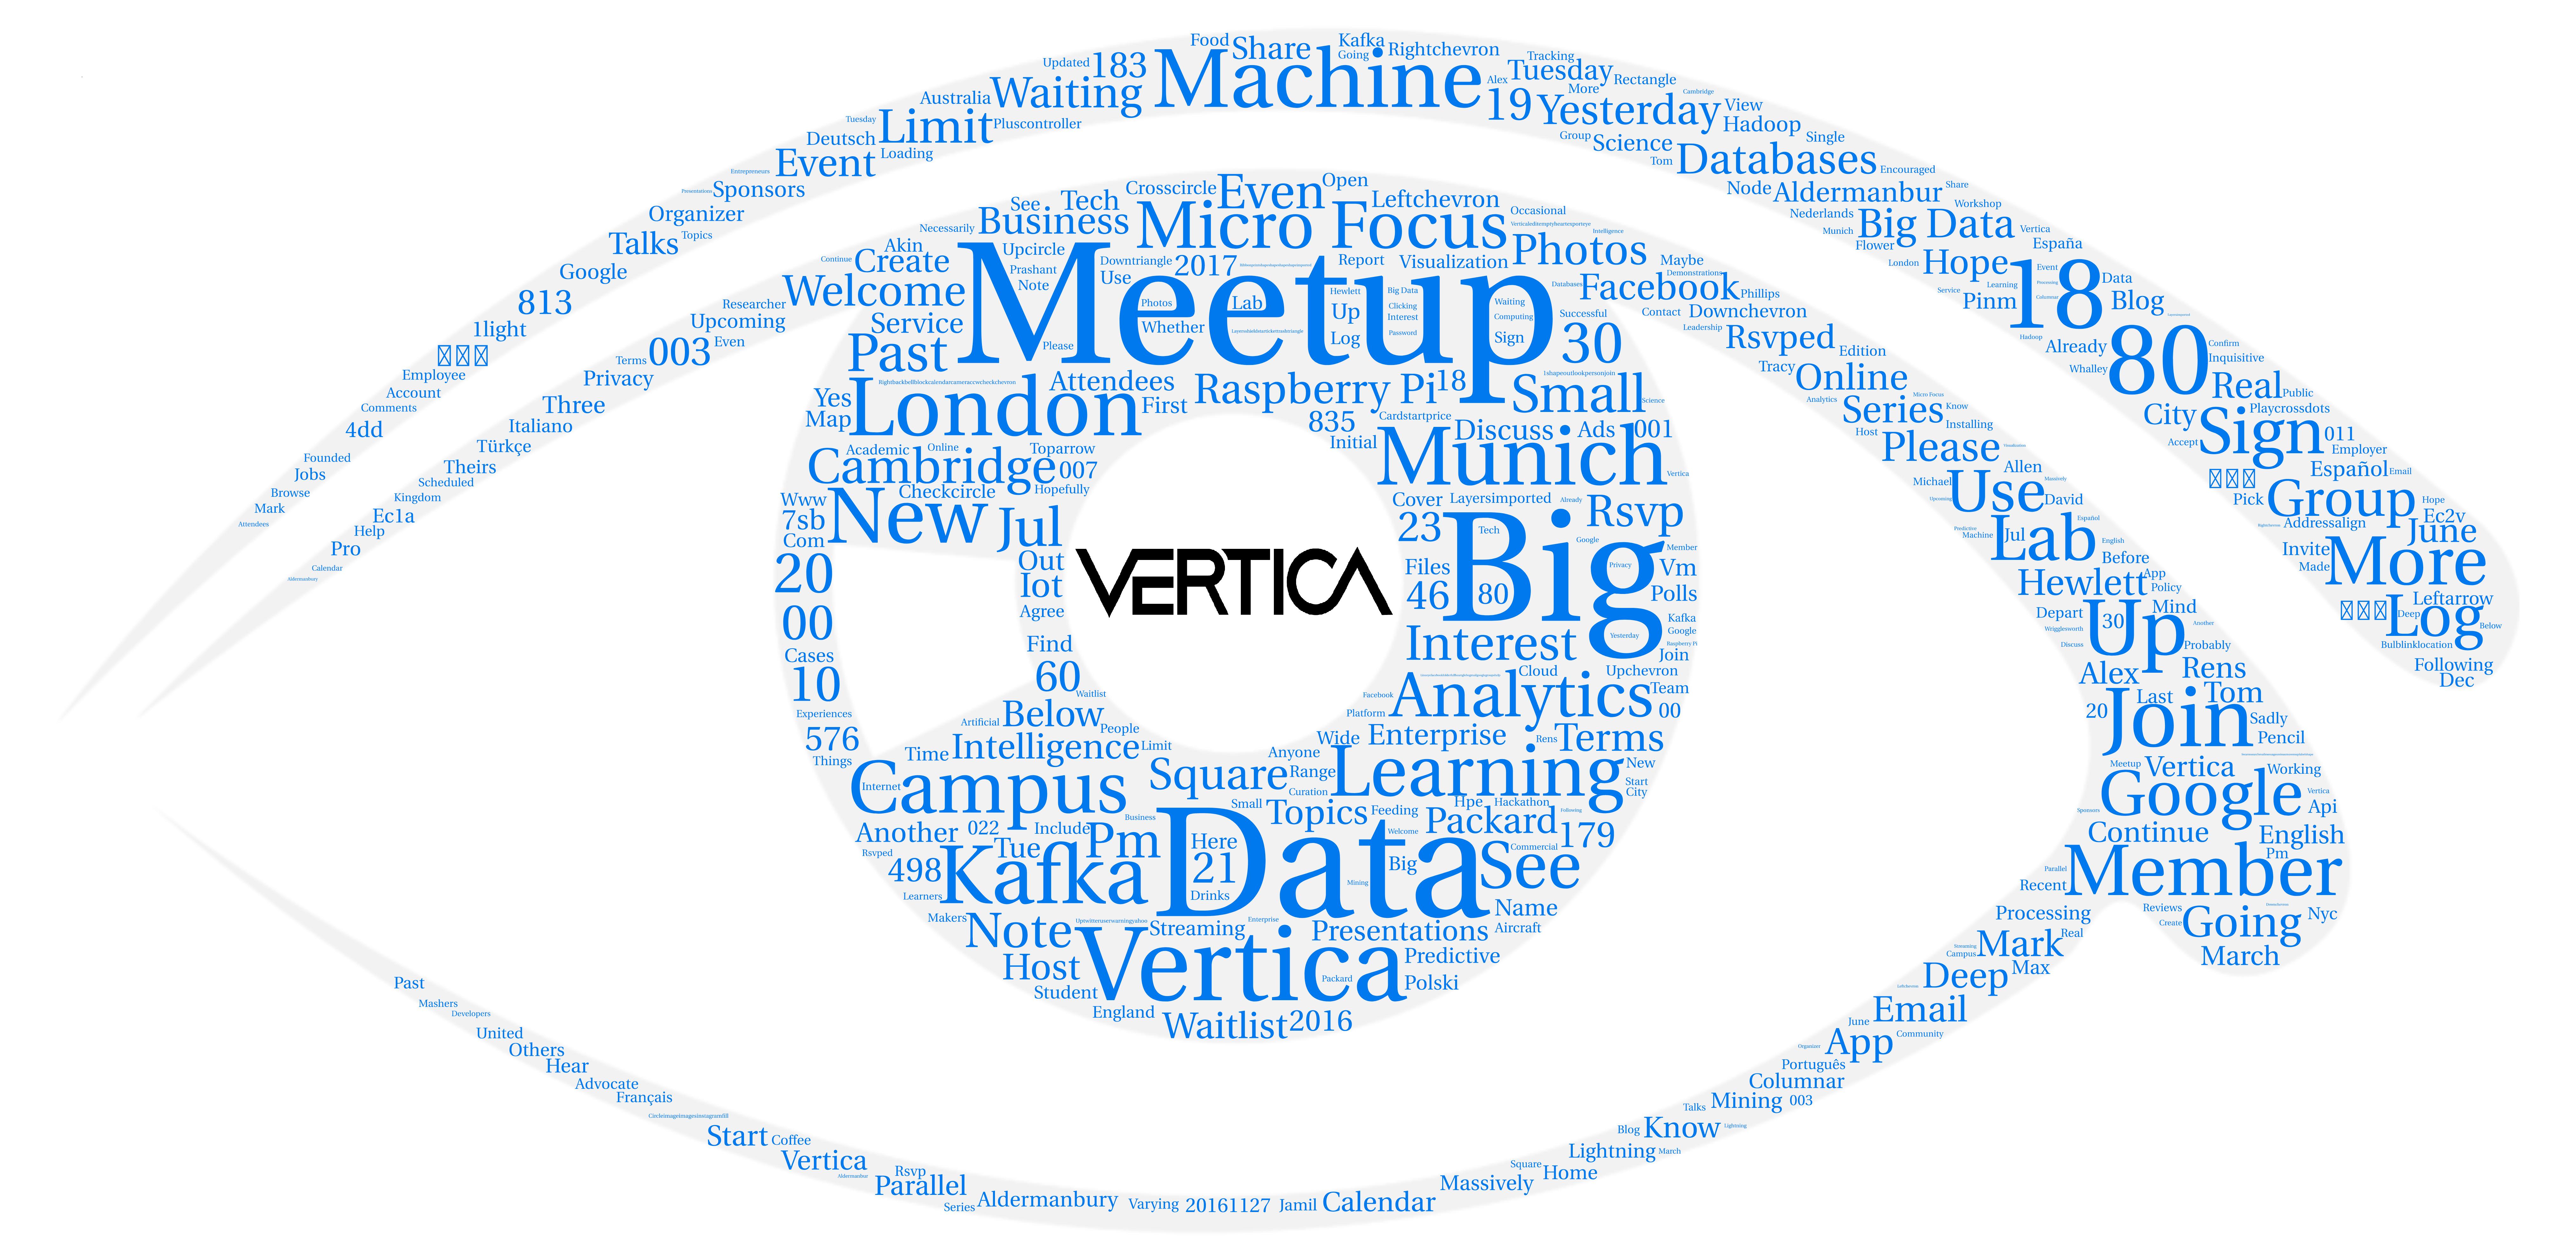 Big Data and Machine Learning - London